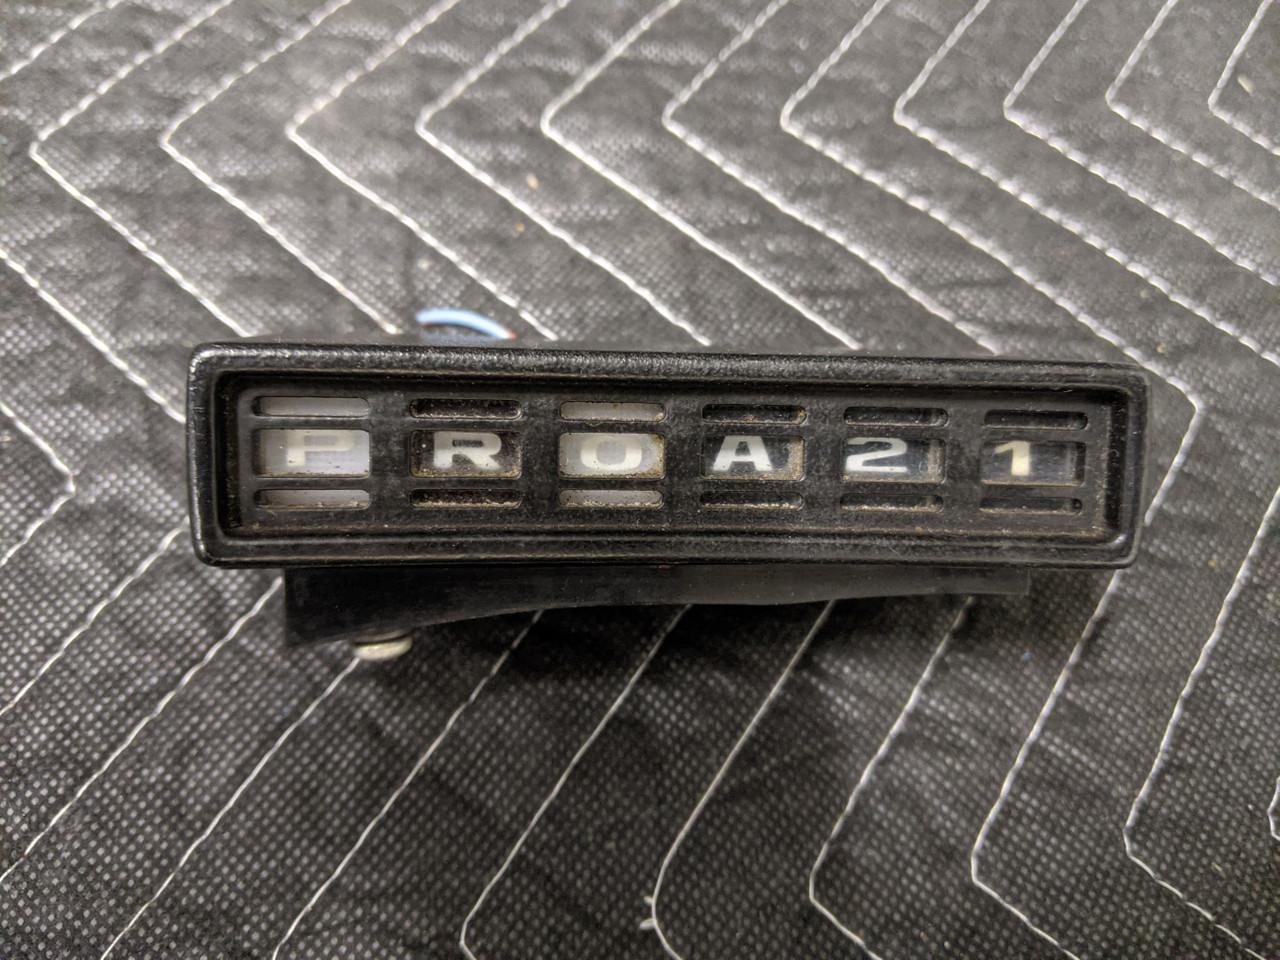 BMW 2.5CS/2800CS/3.0CS Automatic Transmission Gear Position Indicator 62141352334